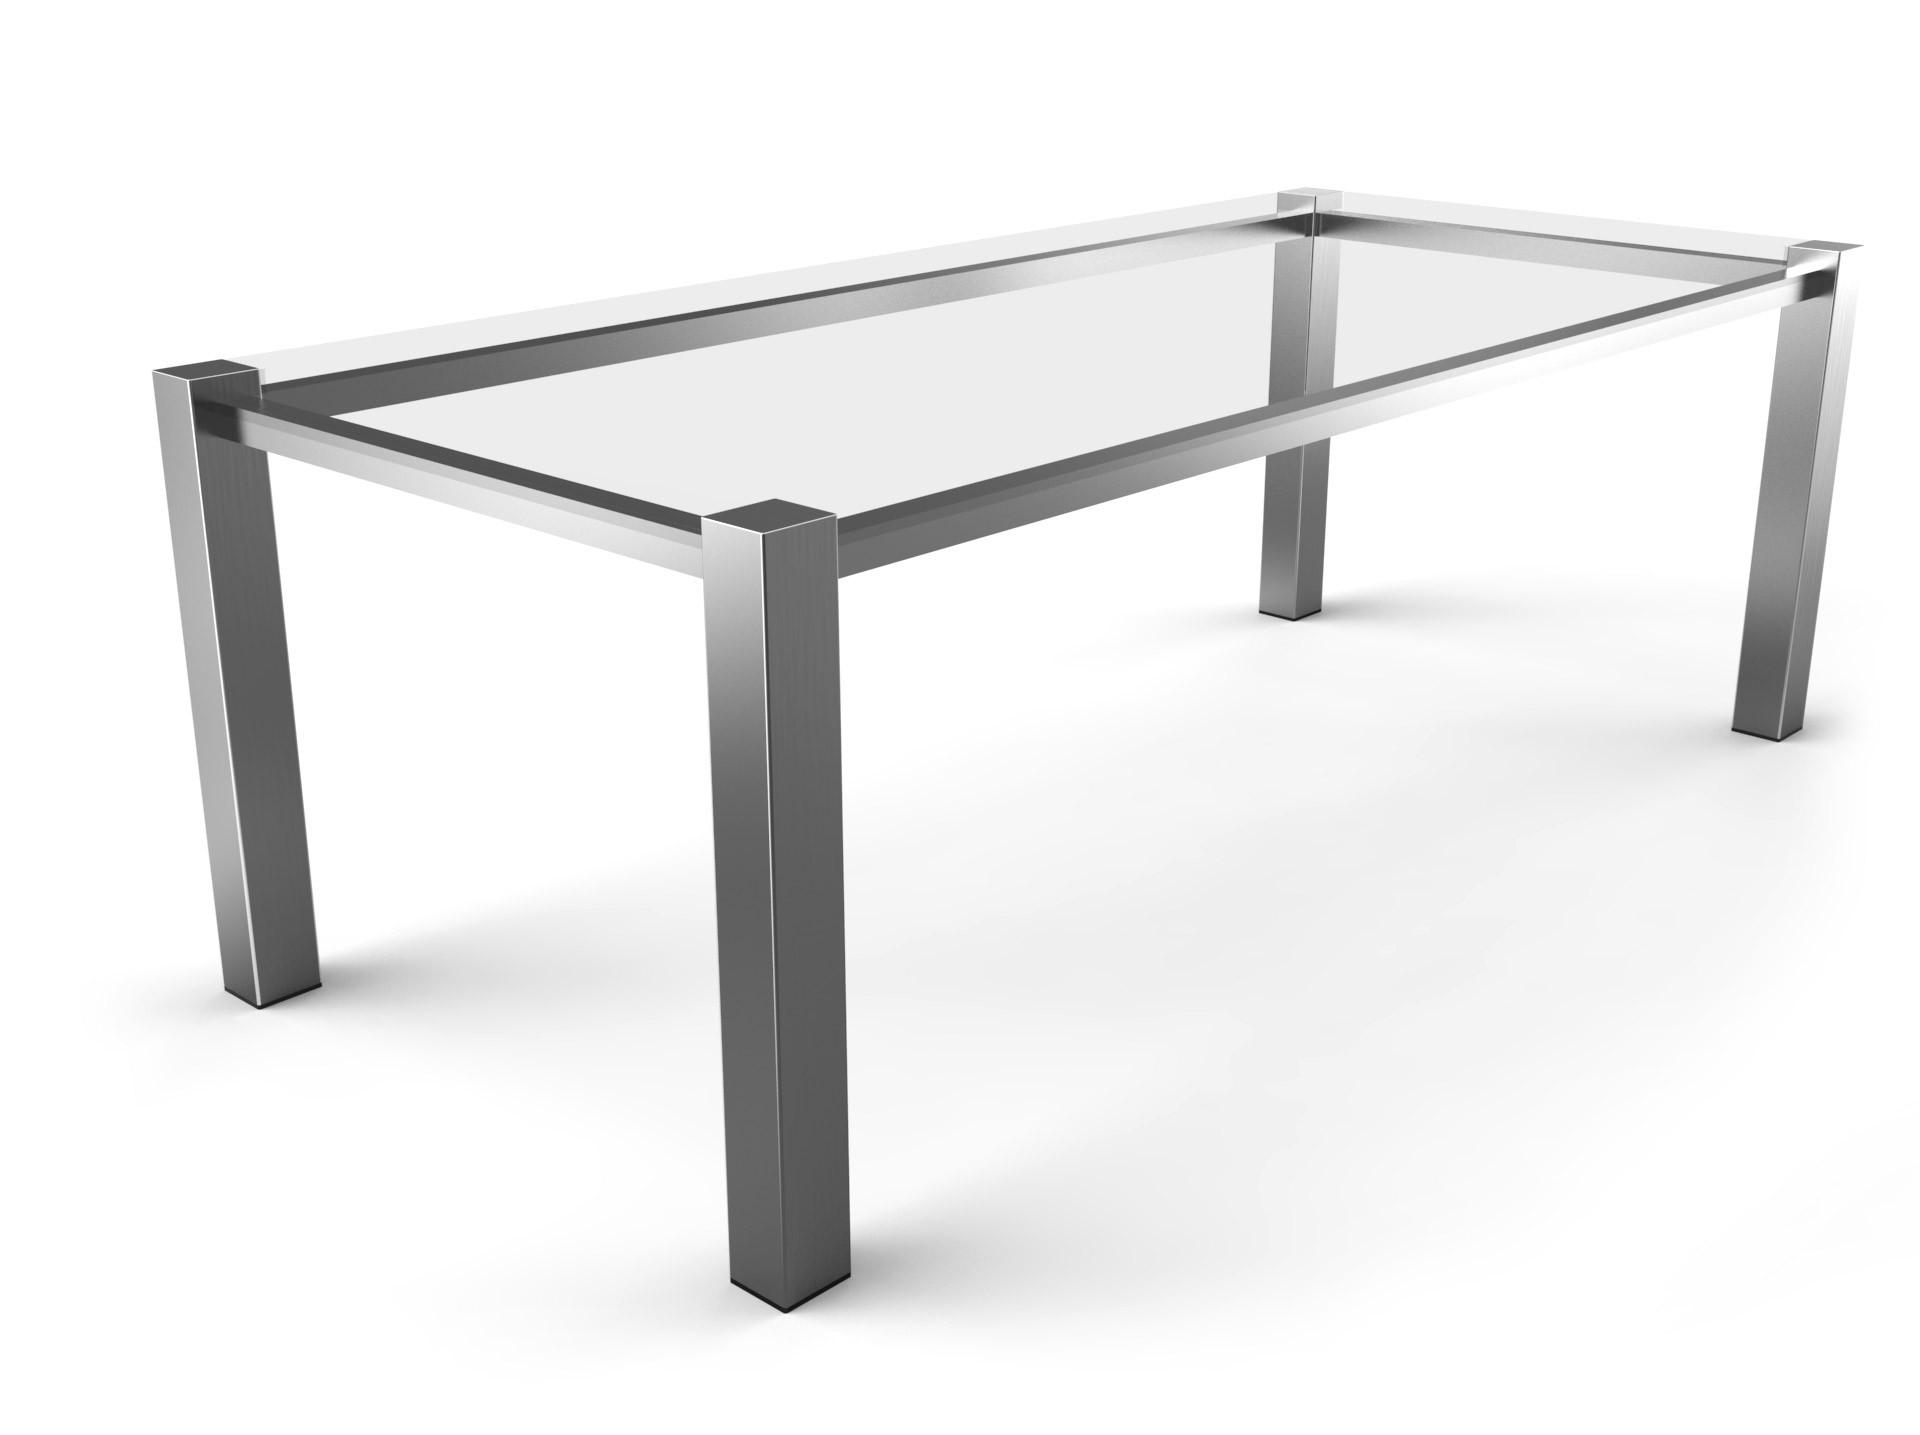 Tischgestell Monza Edelstahl-80